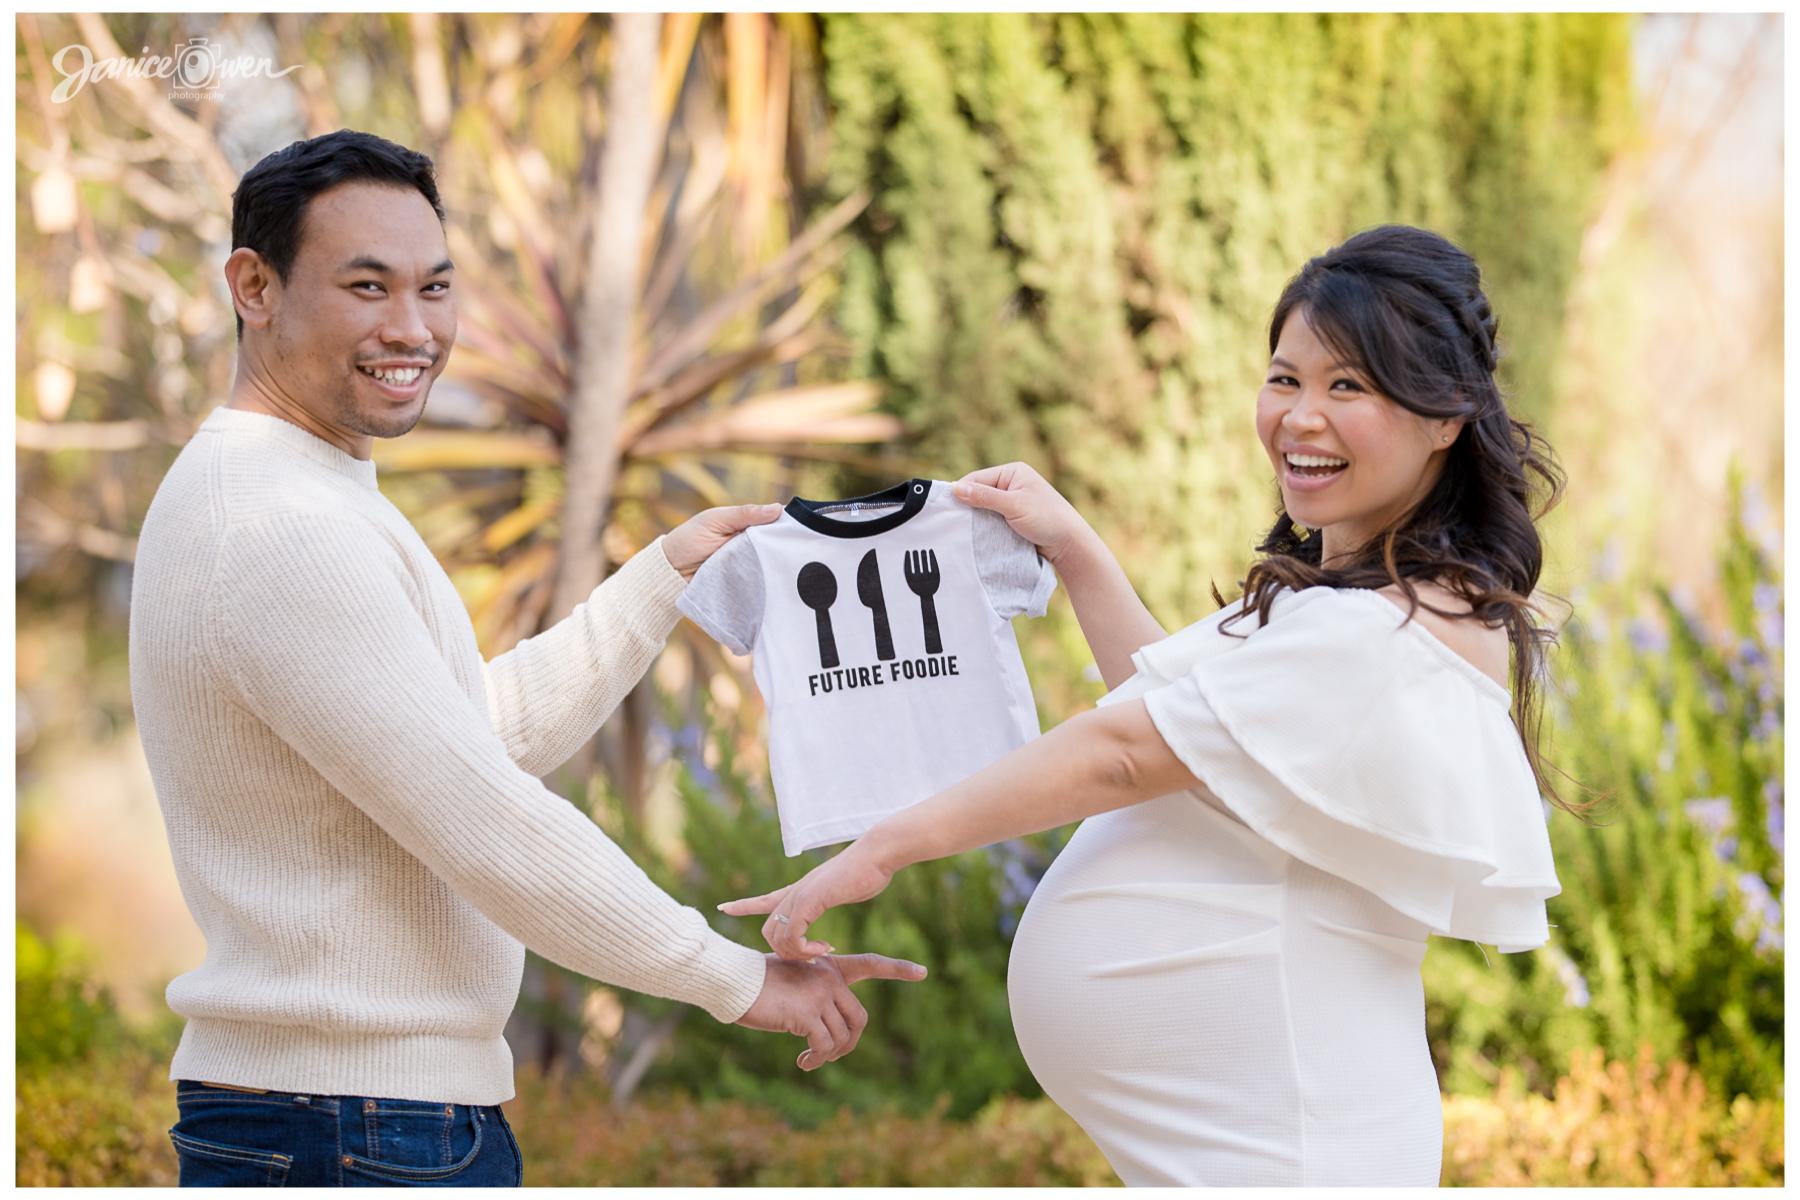 janiceowenphotography_maternity1.jpg